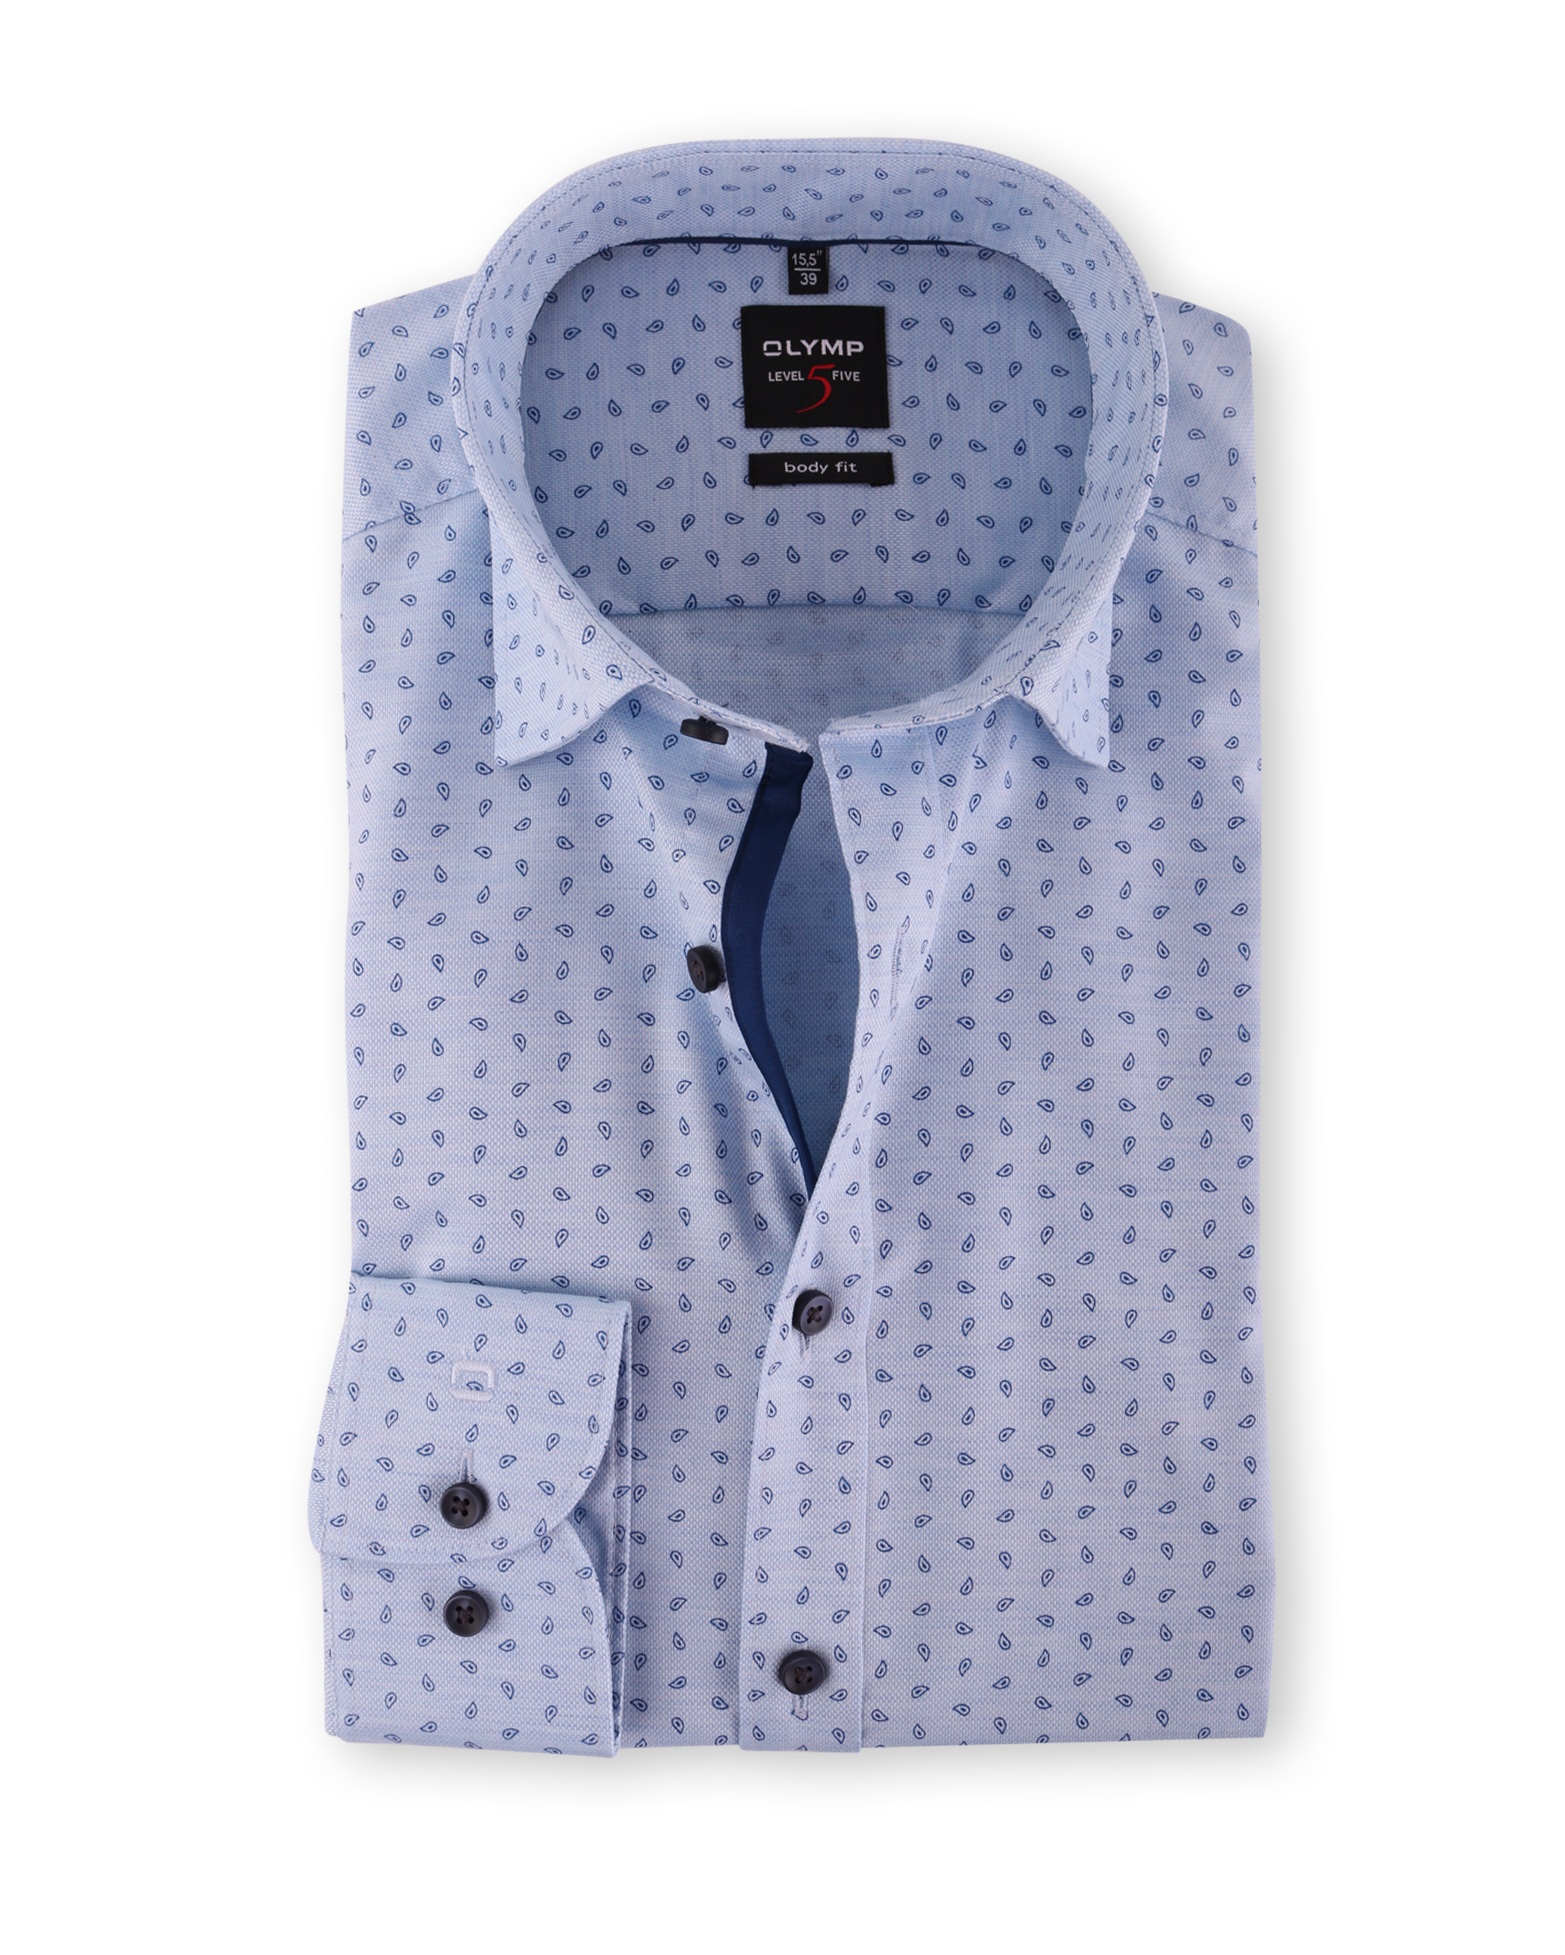 olymp shirt body fit blue drops. Black Bedroom Furniture Sets. Home Design Ideas